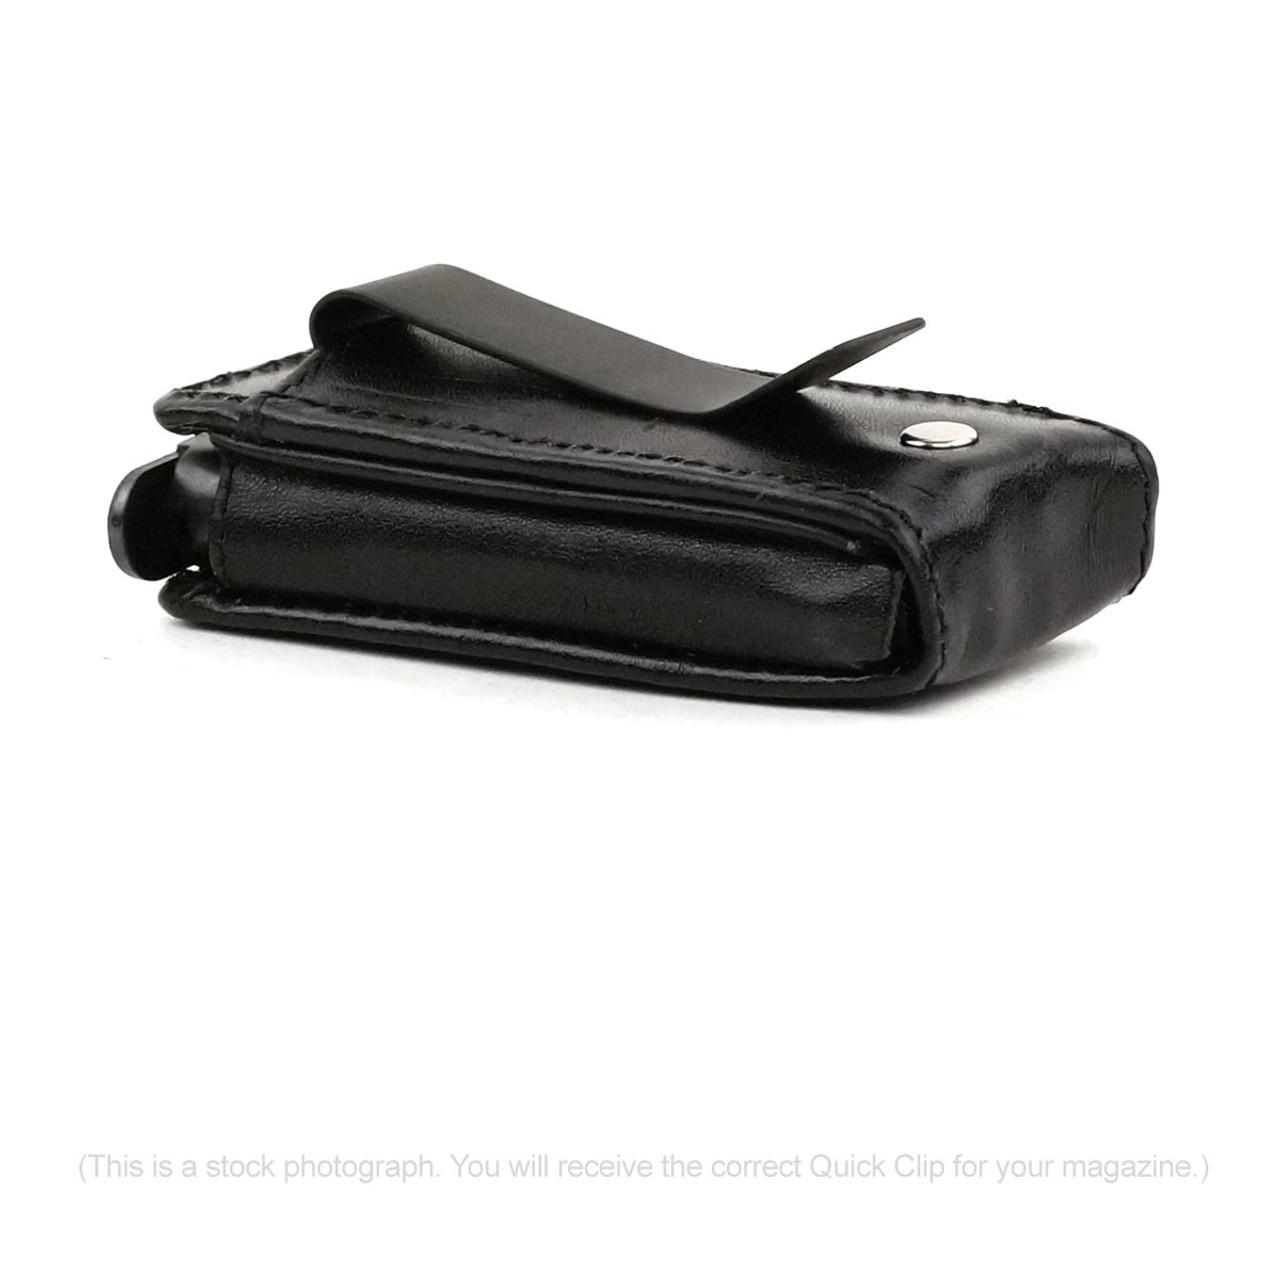 Kimber Micro CDP 9mm Quick Clip Magazine Holster